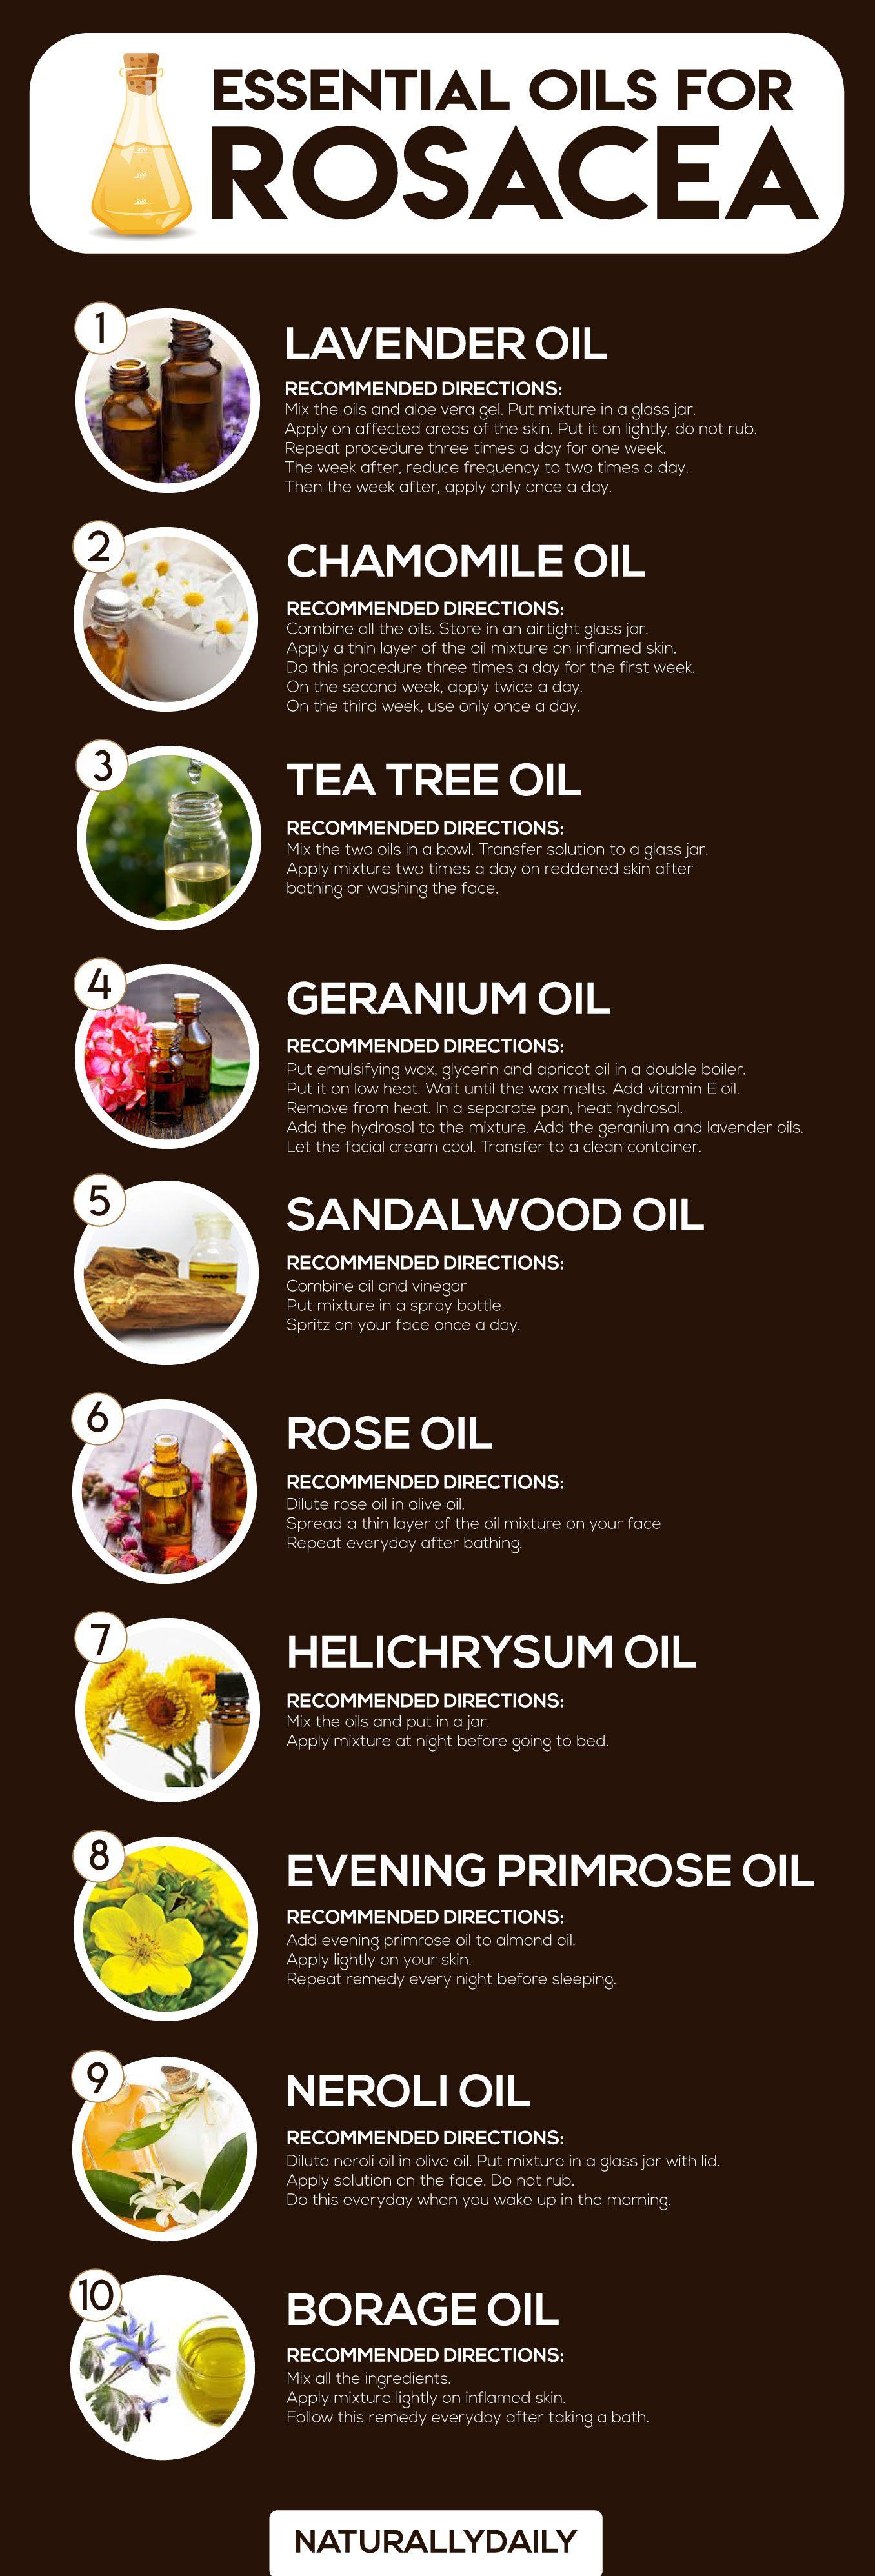 13 Essential Oils for Rosacea and How to Use Them #diyskincare